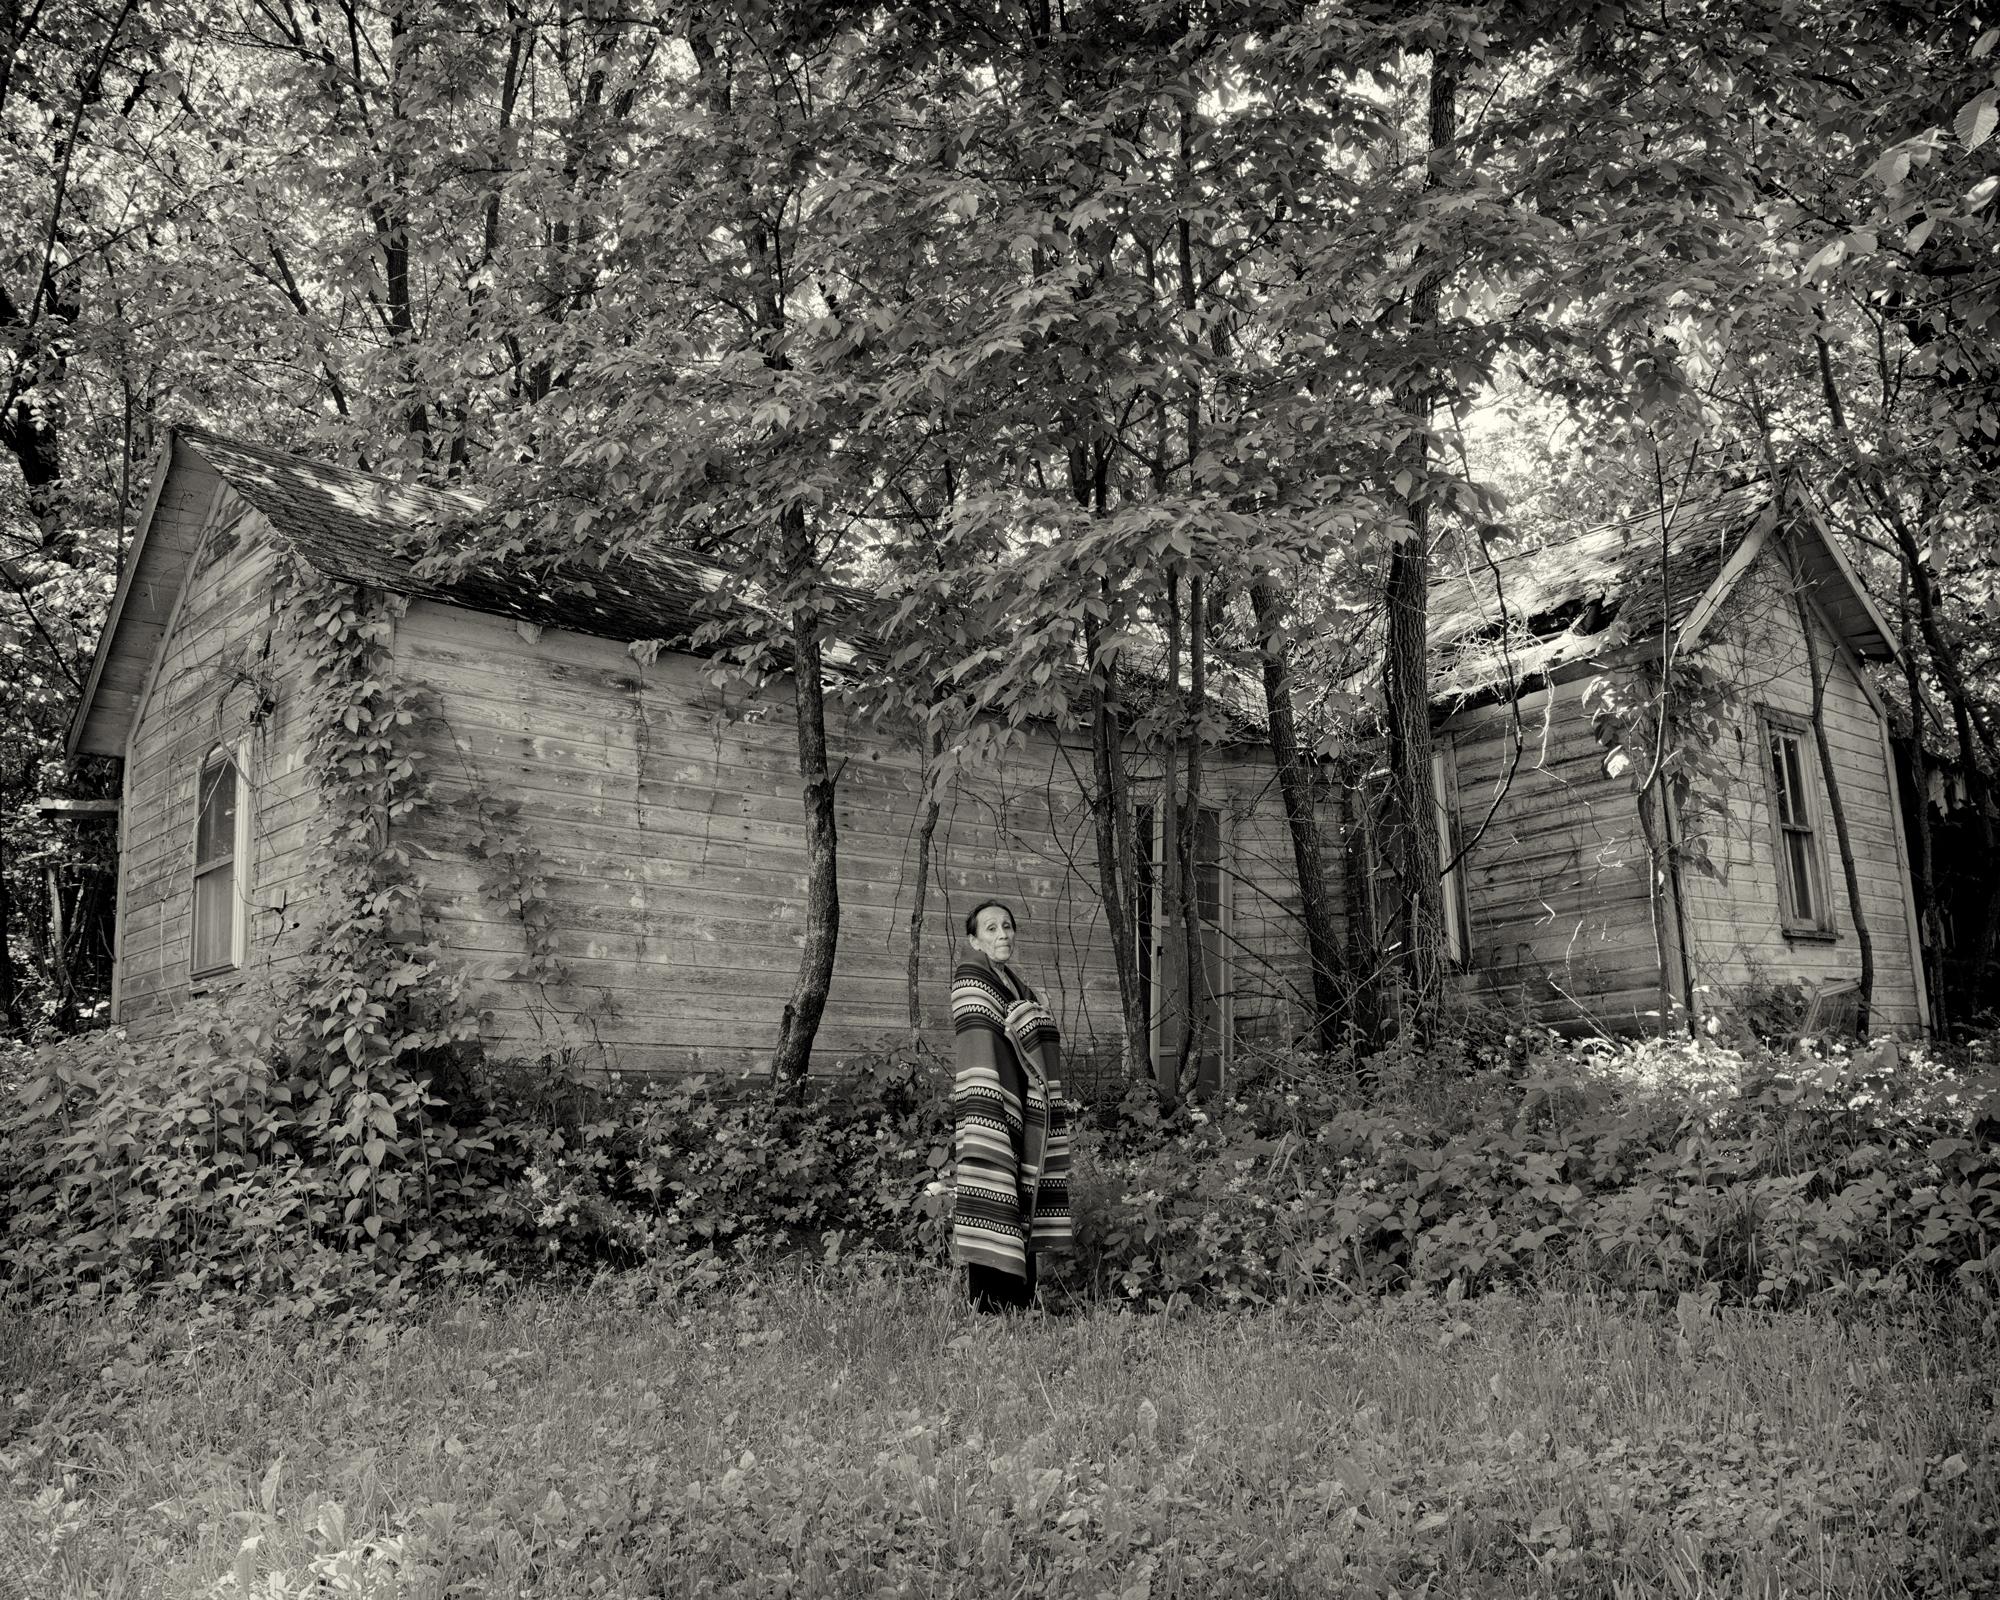 mitchell_homestead_01.jpg